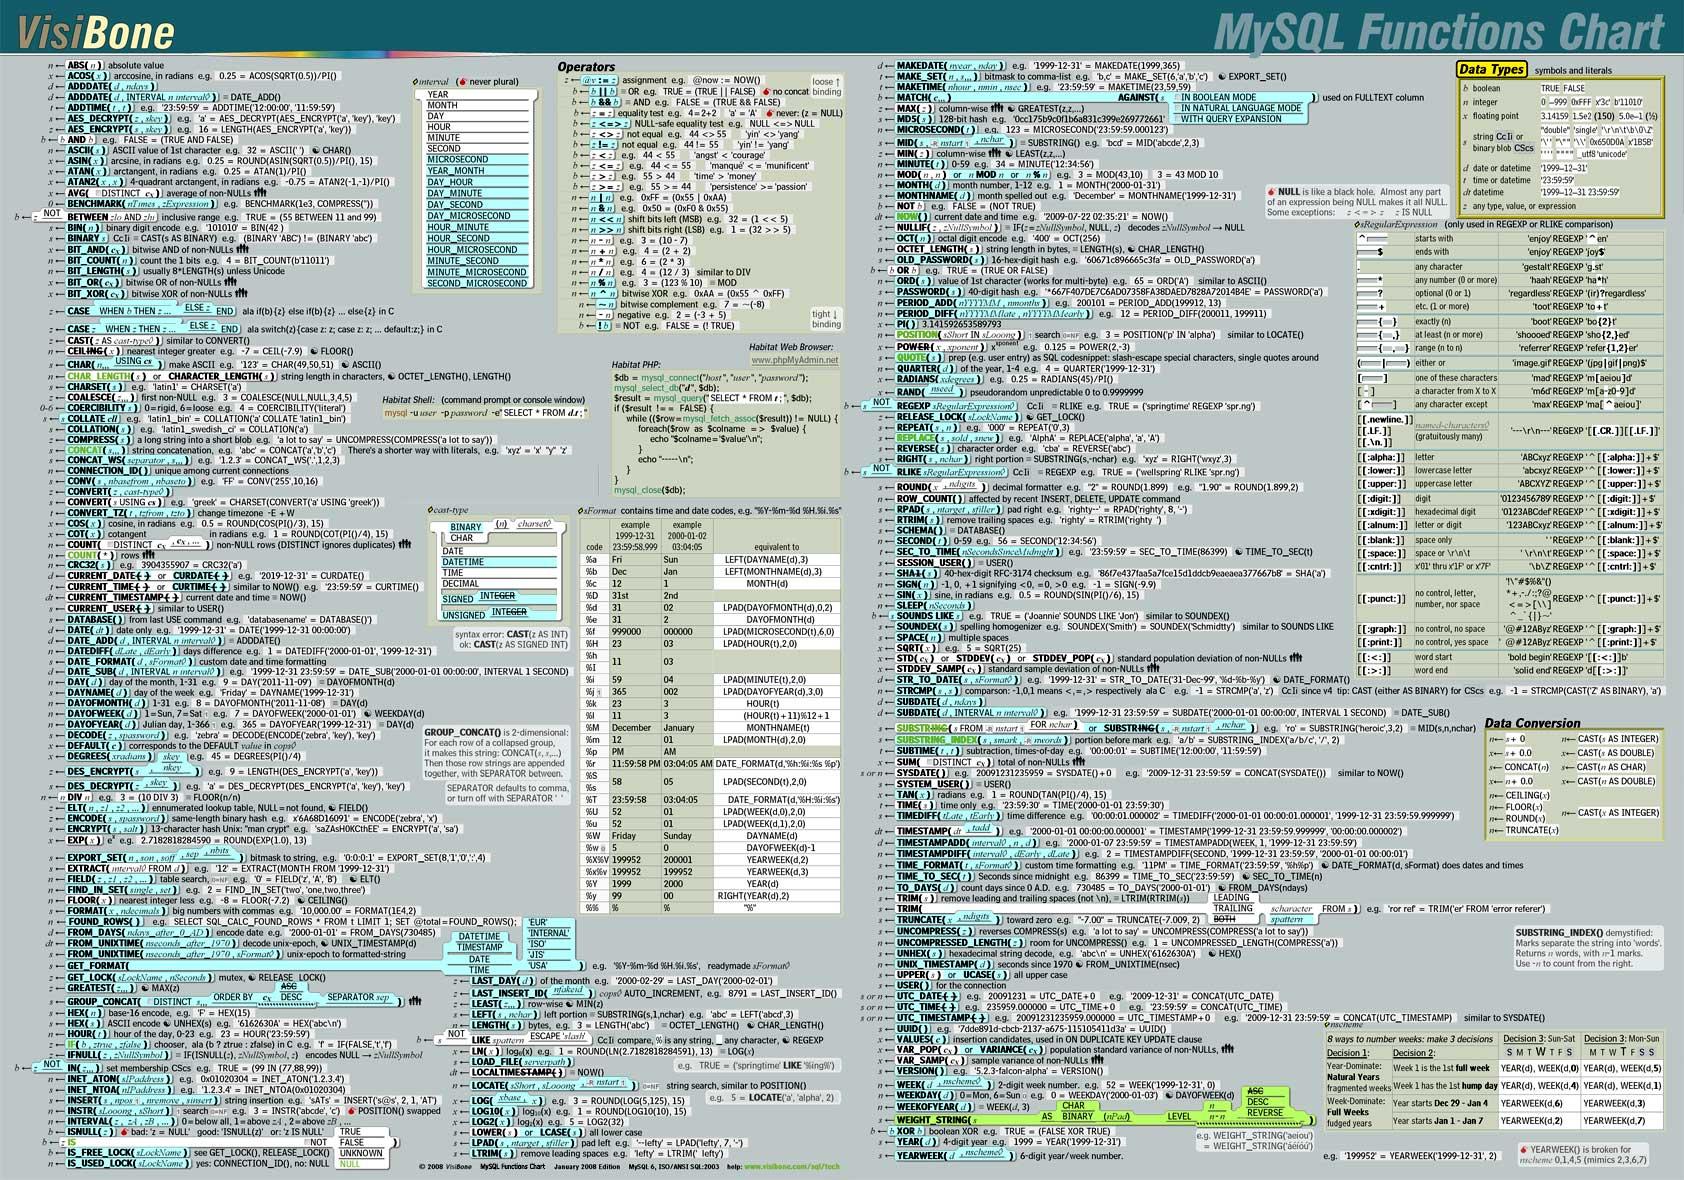 Cheat Sheet - MySQL functions